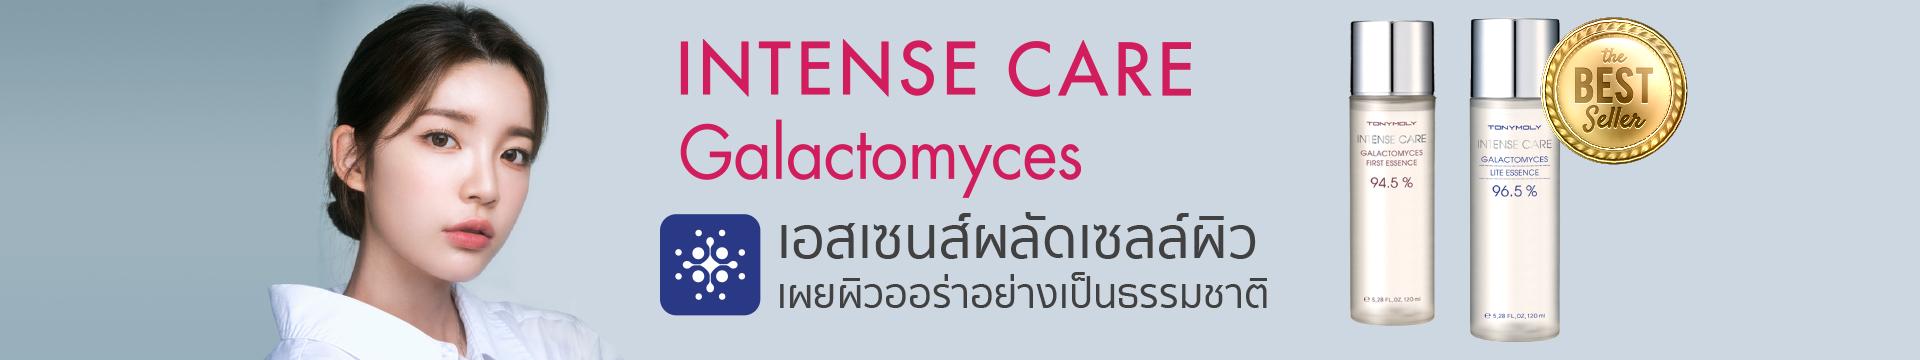 https://www.konvy.com/list/?title=Tonymoly+Intense+Care+Galactomyces